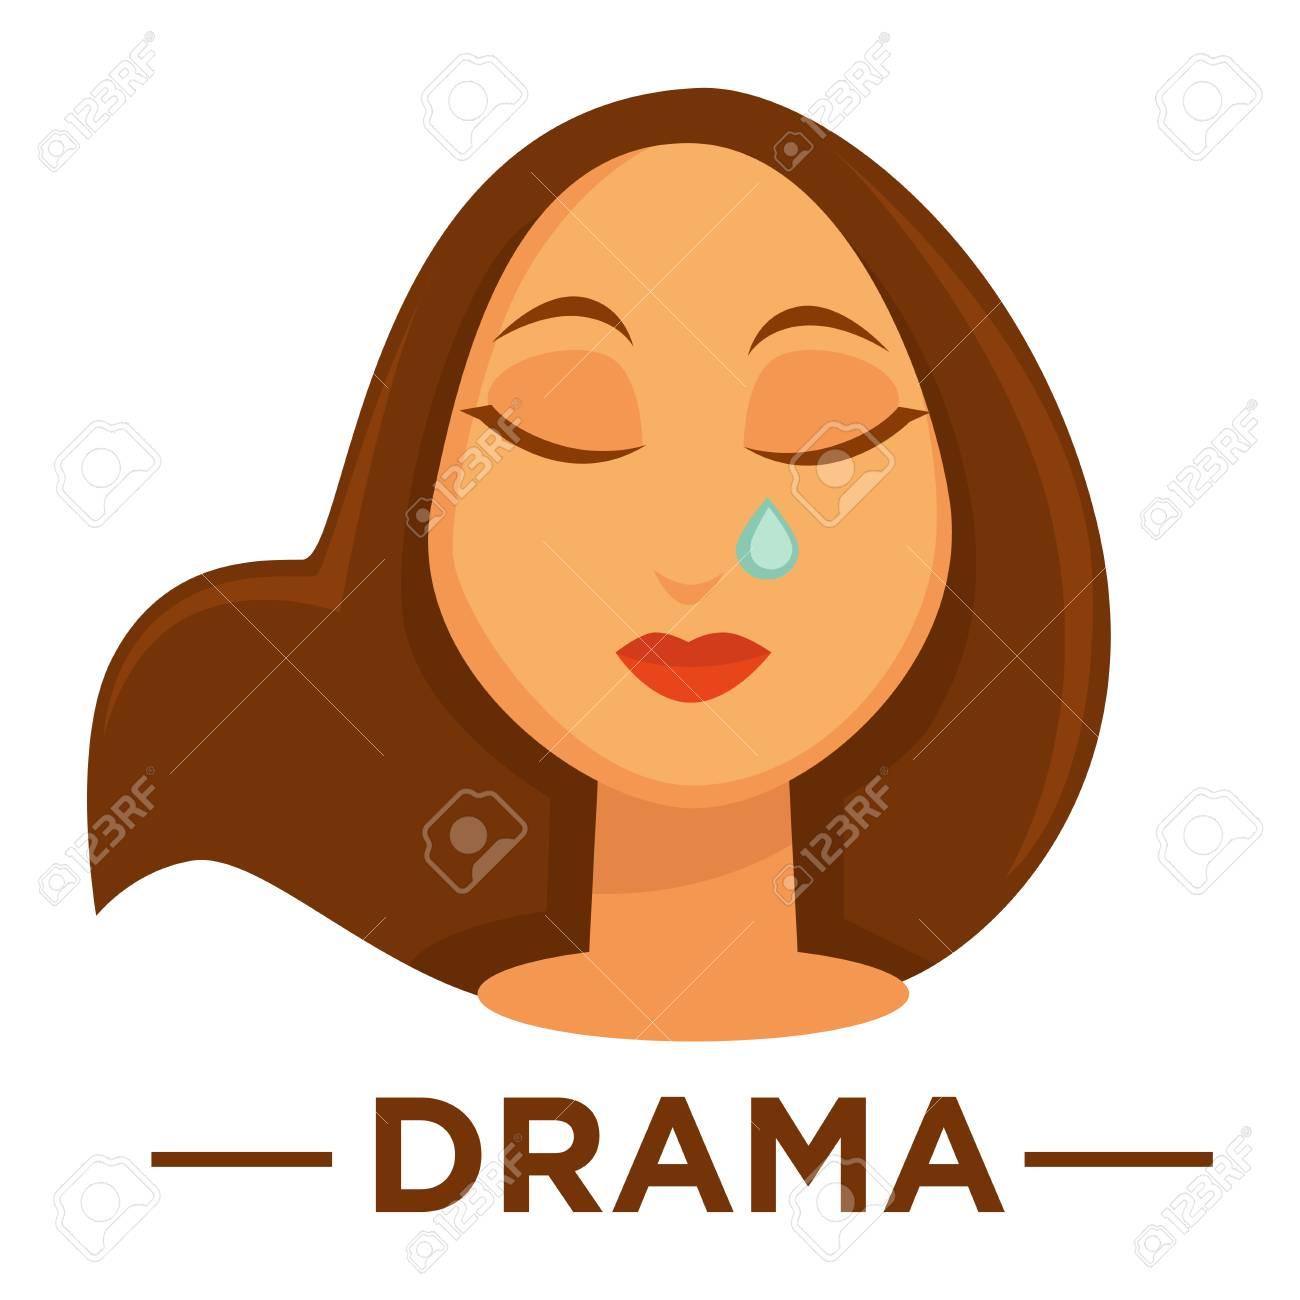 Movie genre icon logo drama of woman crying tear vector flat movie genre icon logo drama of woman crying tear vector flat isolated symbol template for biocorpaavc